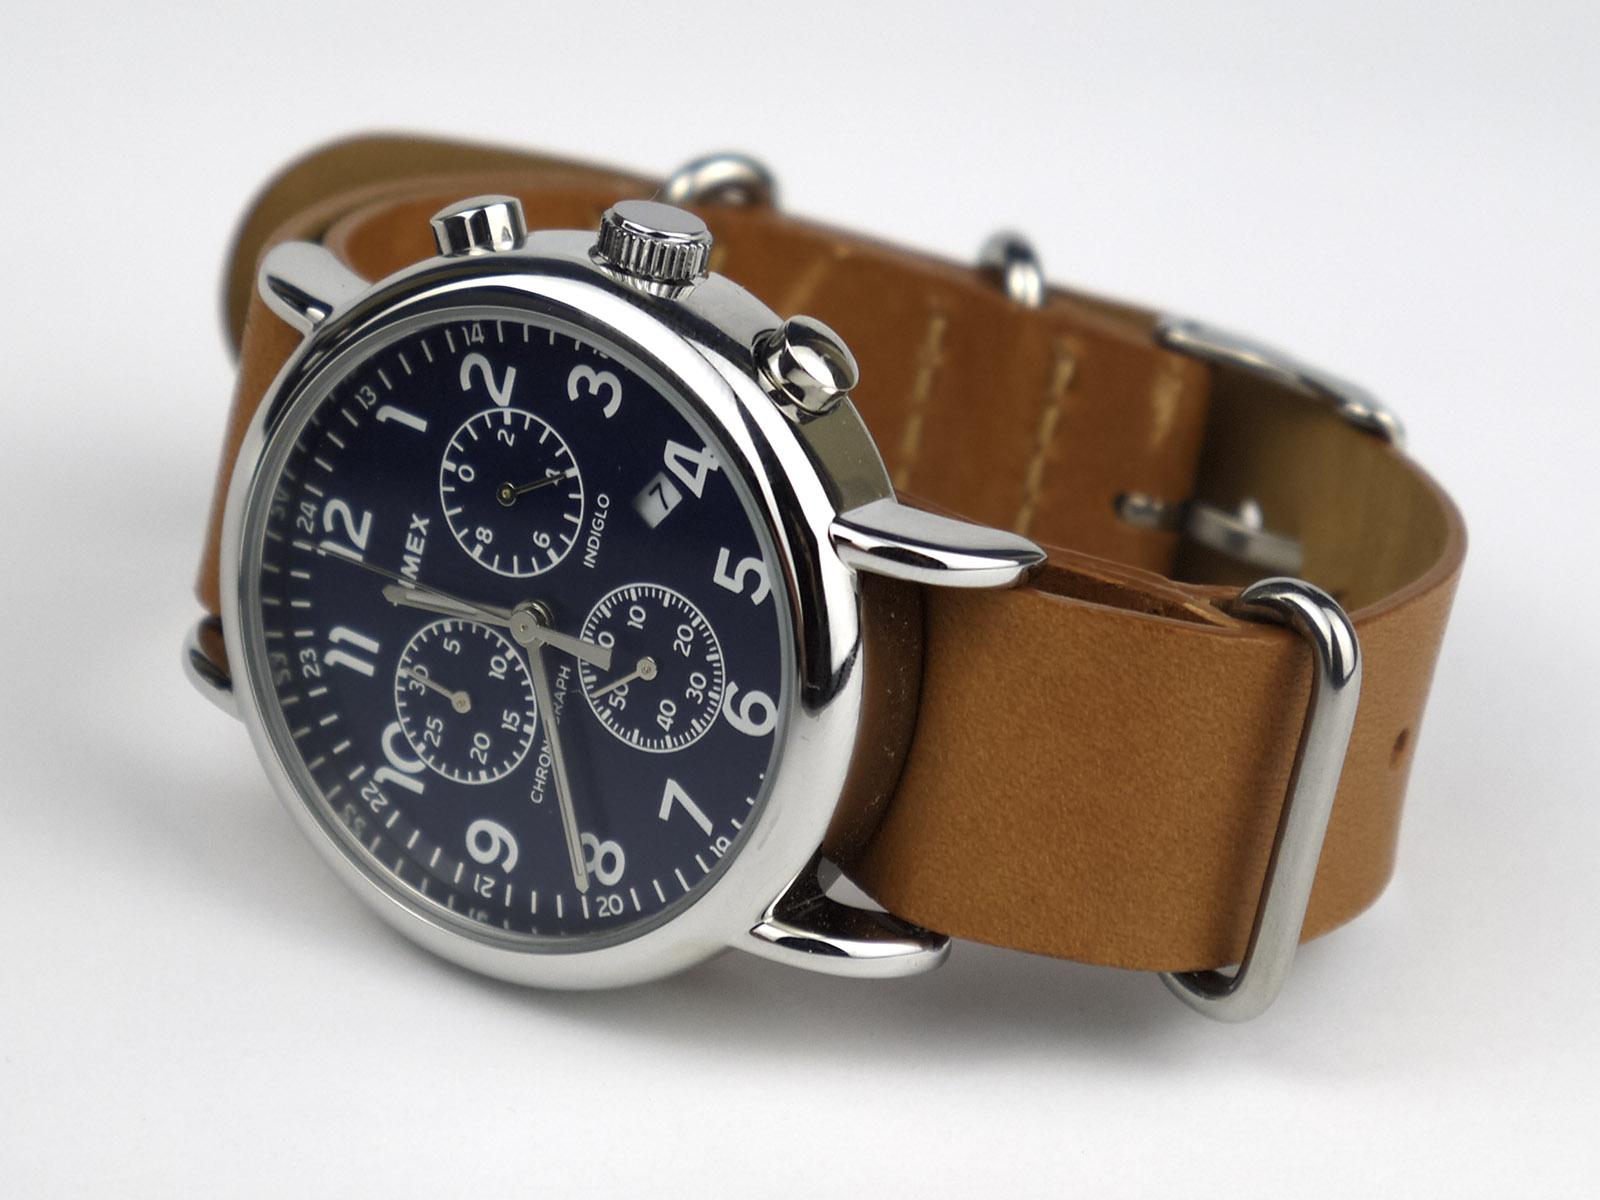 Timex Tw2p62300 Weekender Watch ⋆ High Quality Watch Gallery